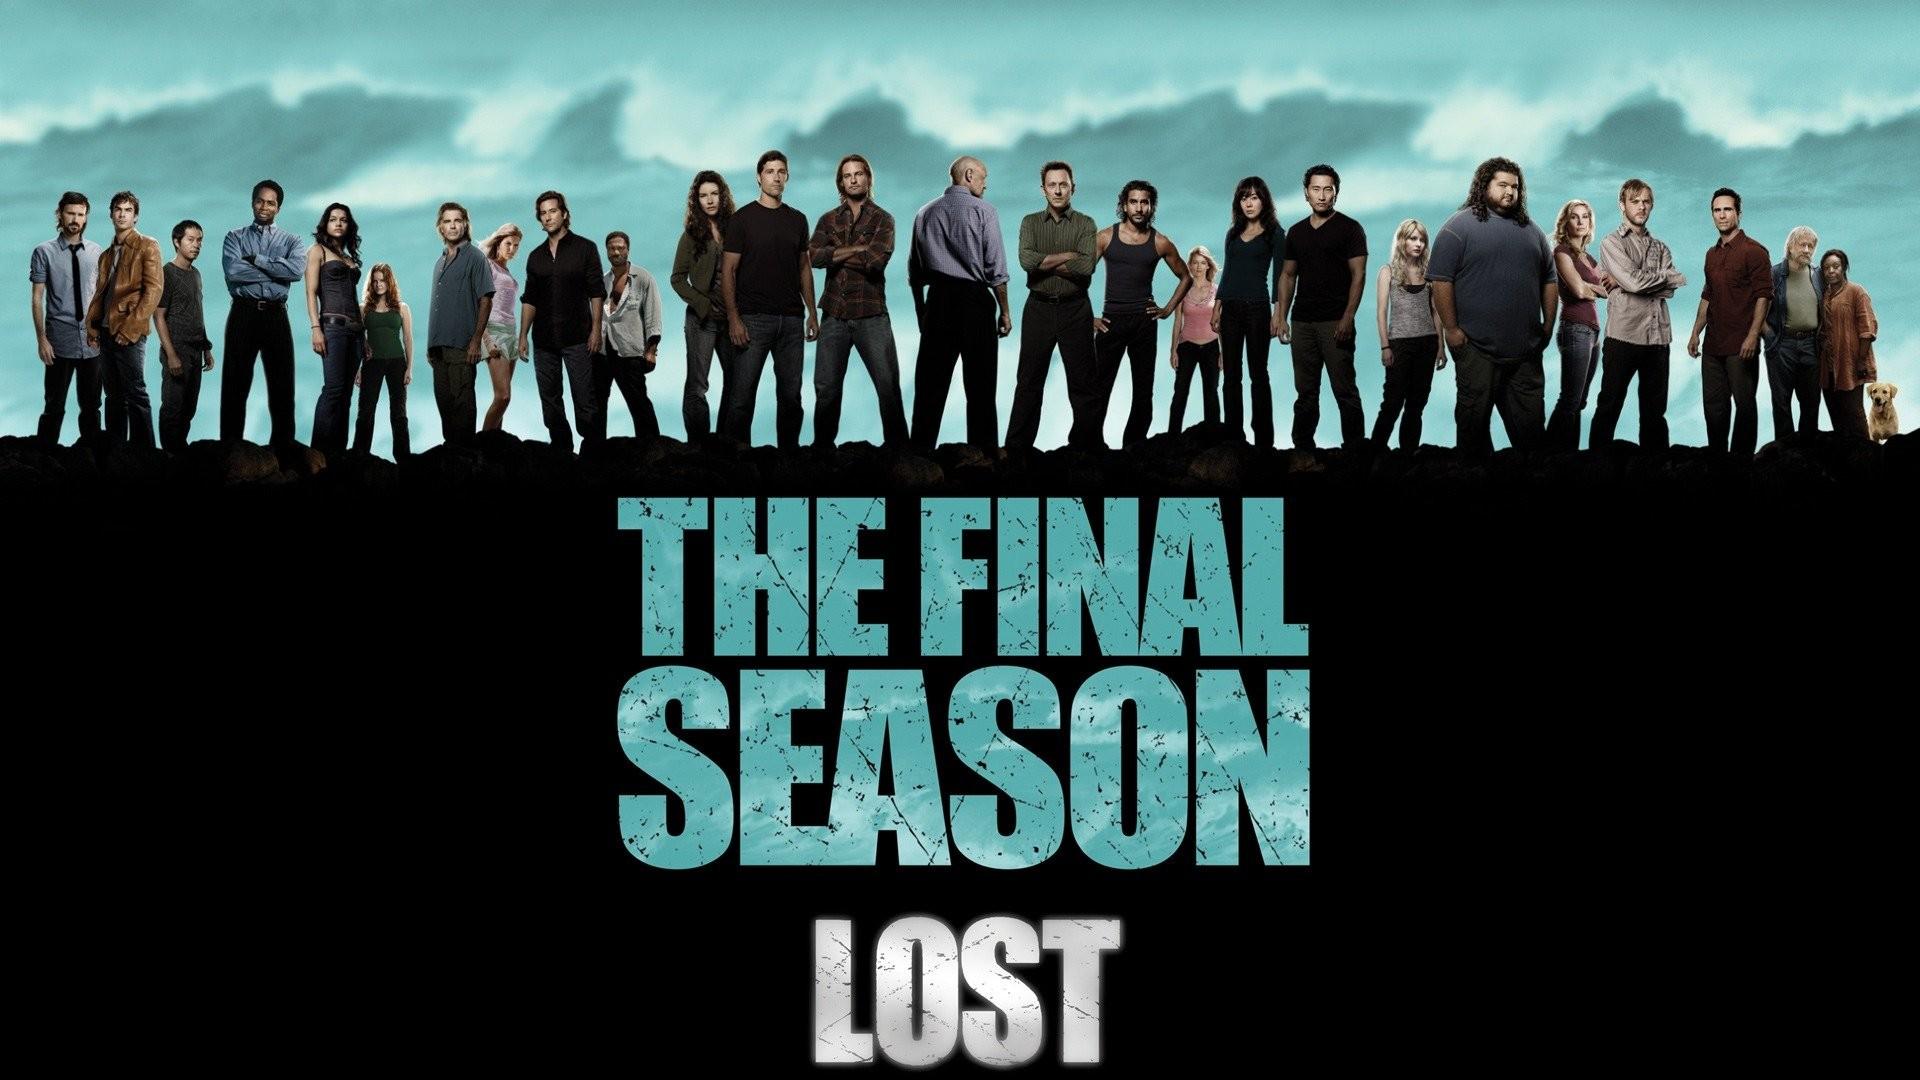 Lost Season 6 Wallpaper Wallpapertag